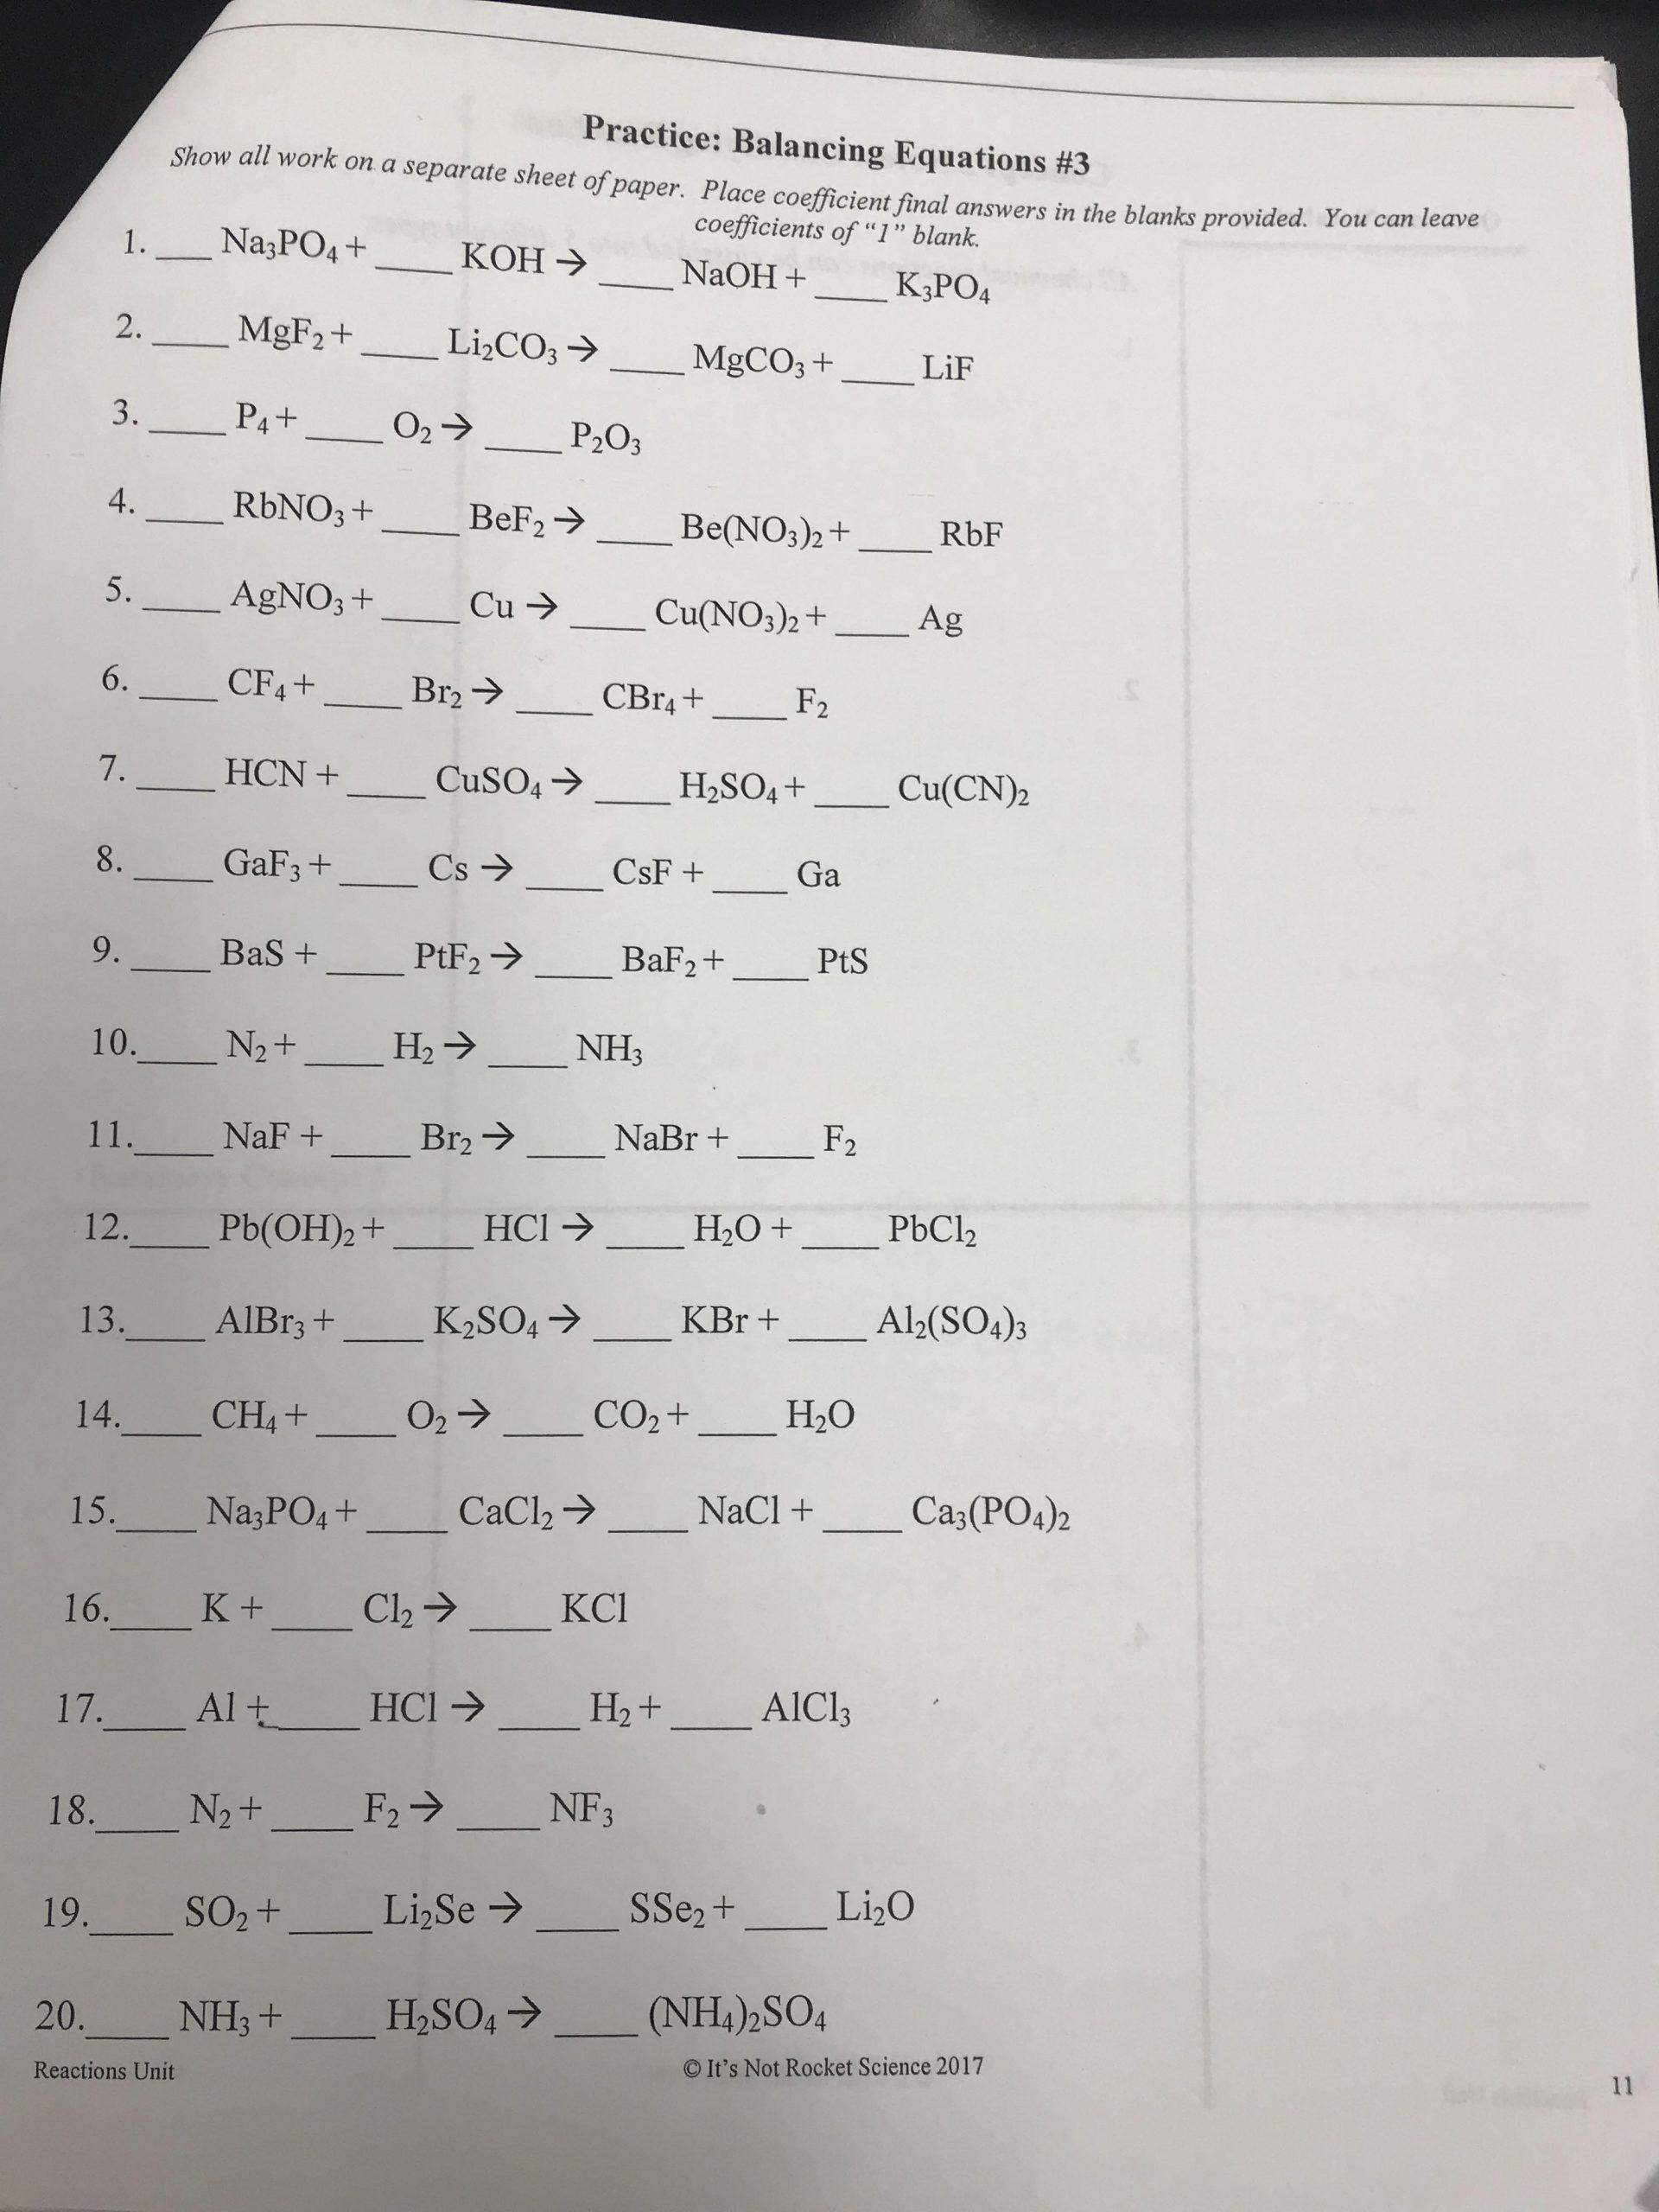 Balancing Equations Worksheet Answers Grade 9 Physical Science Chemical Reactions] Balancing